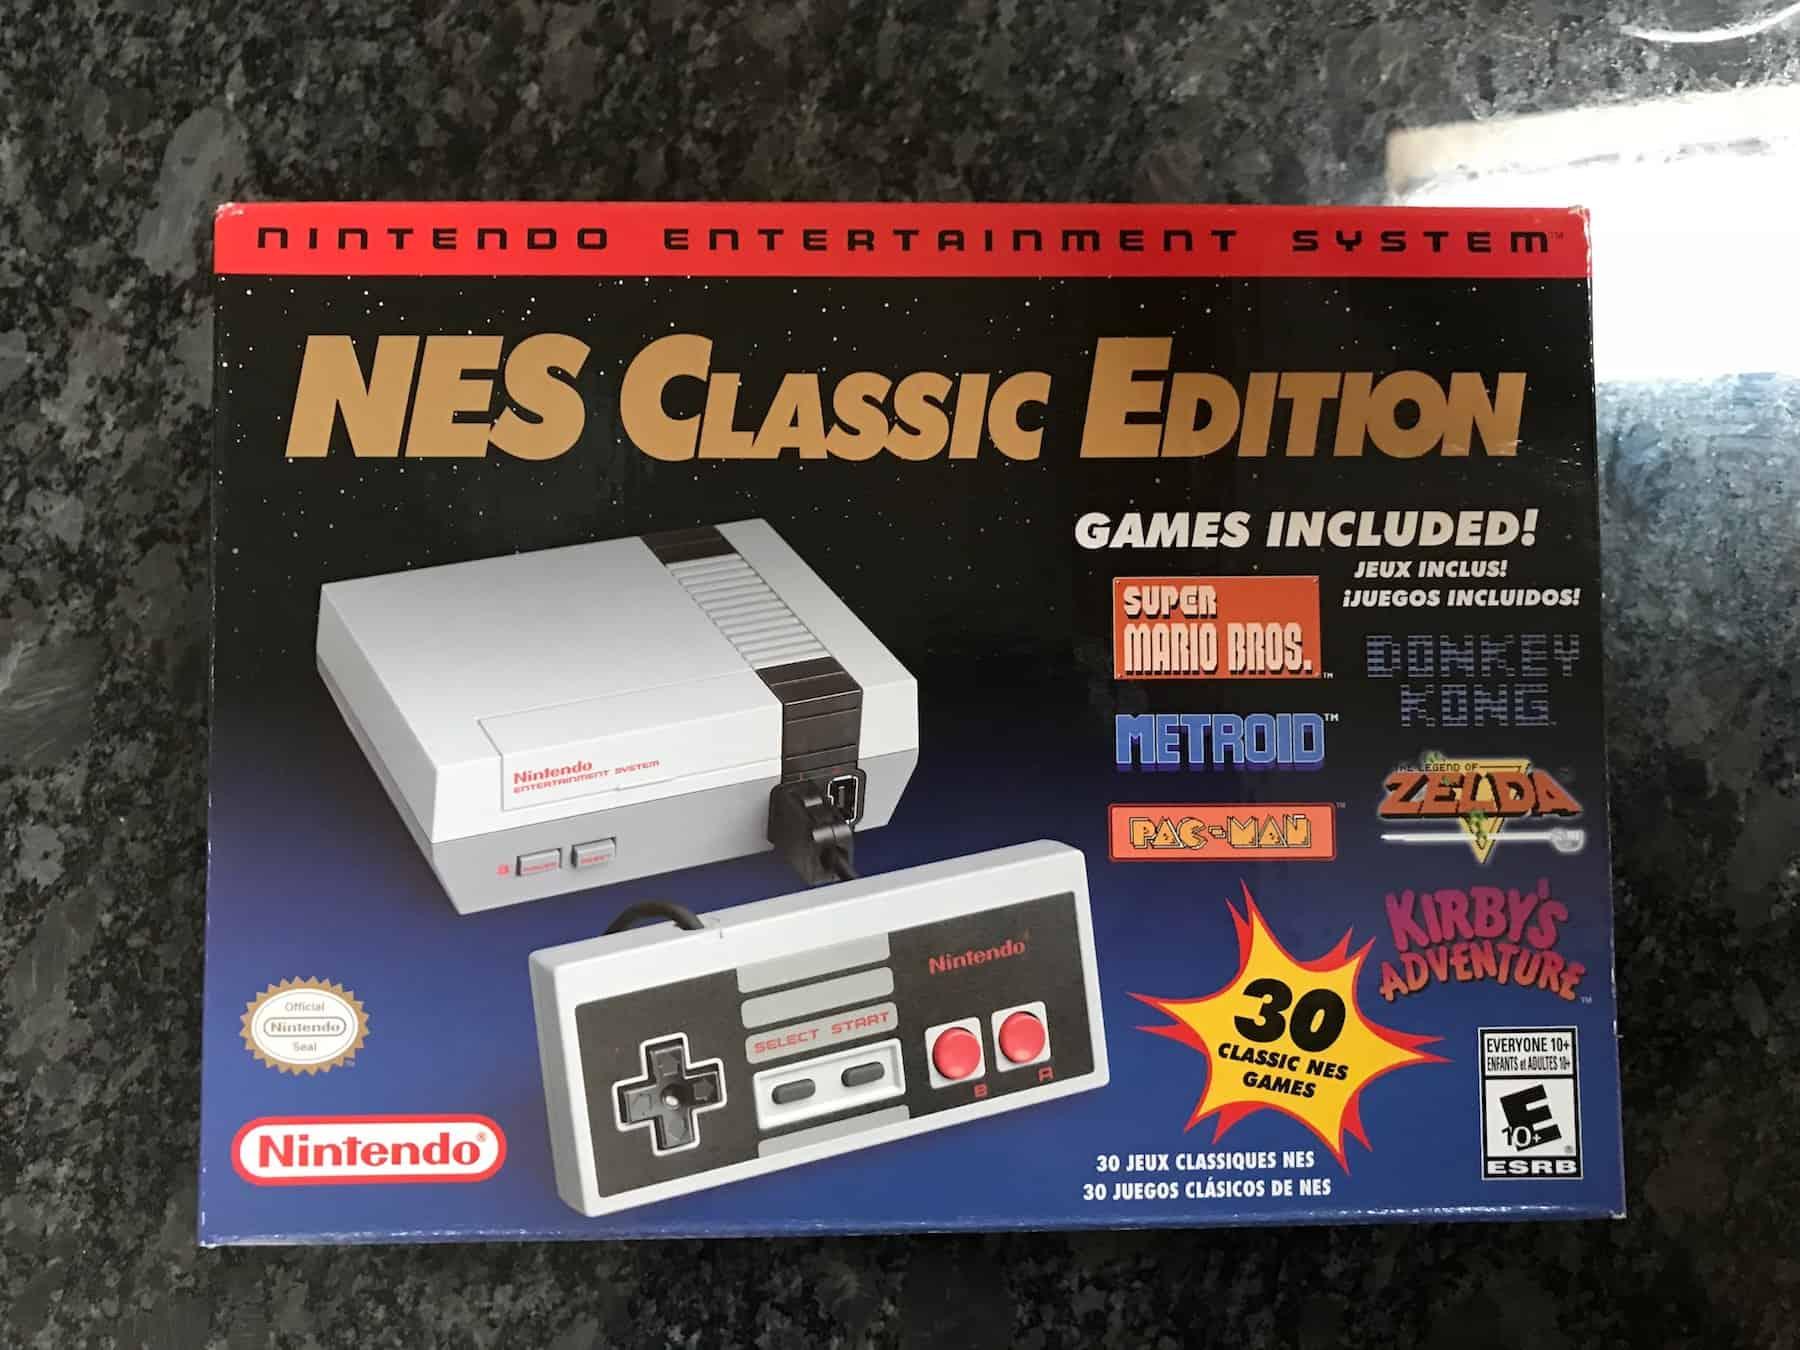 a picture of a NES classic mini